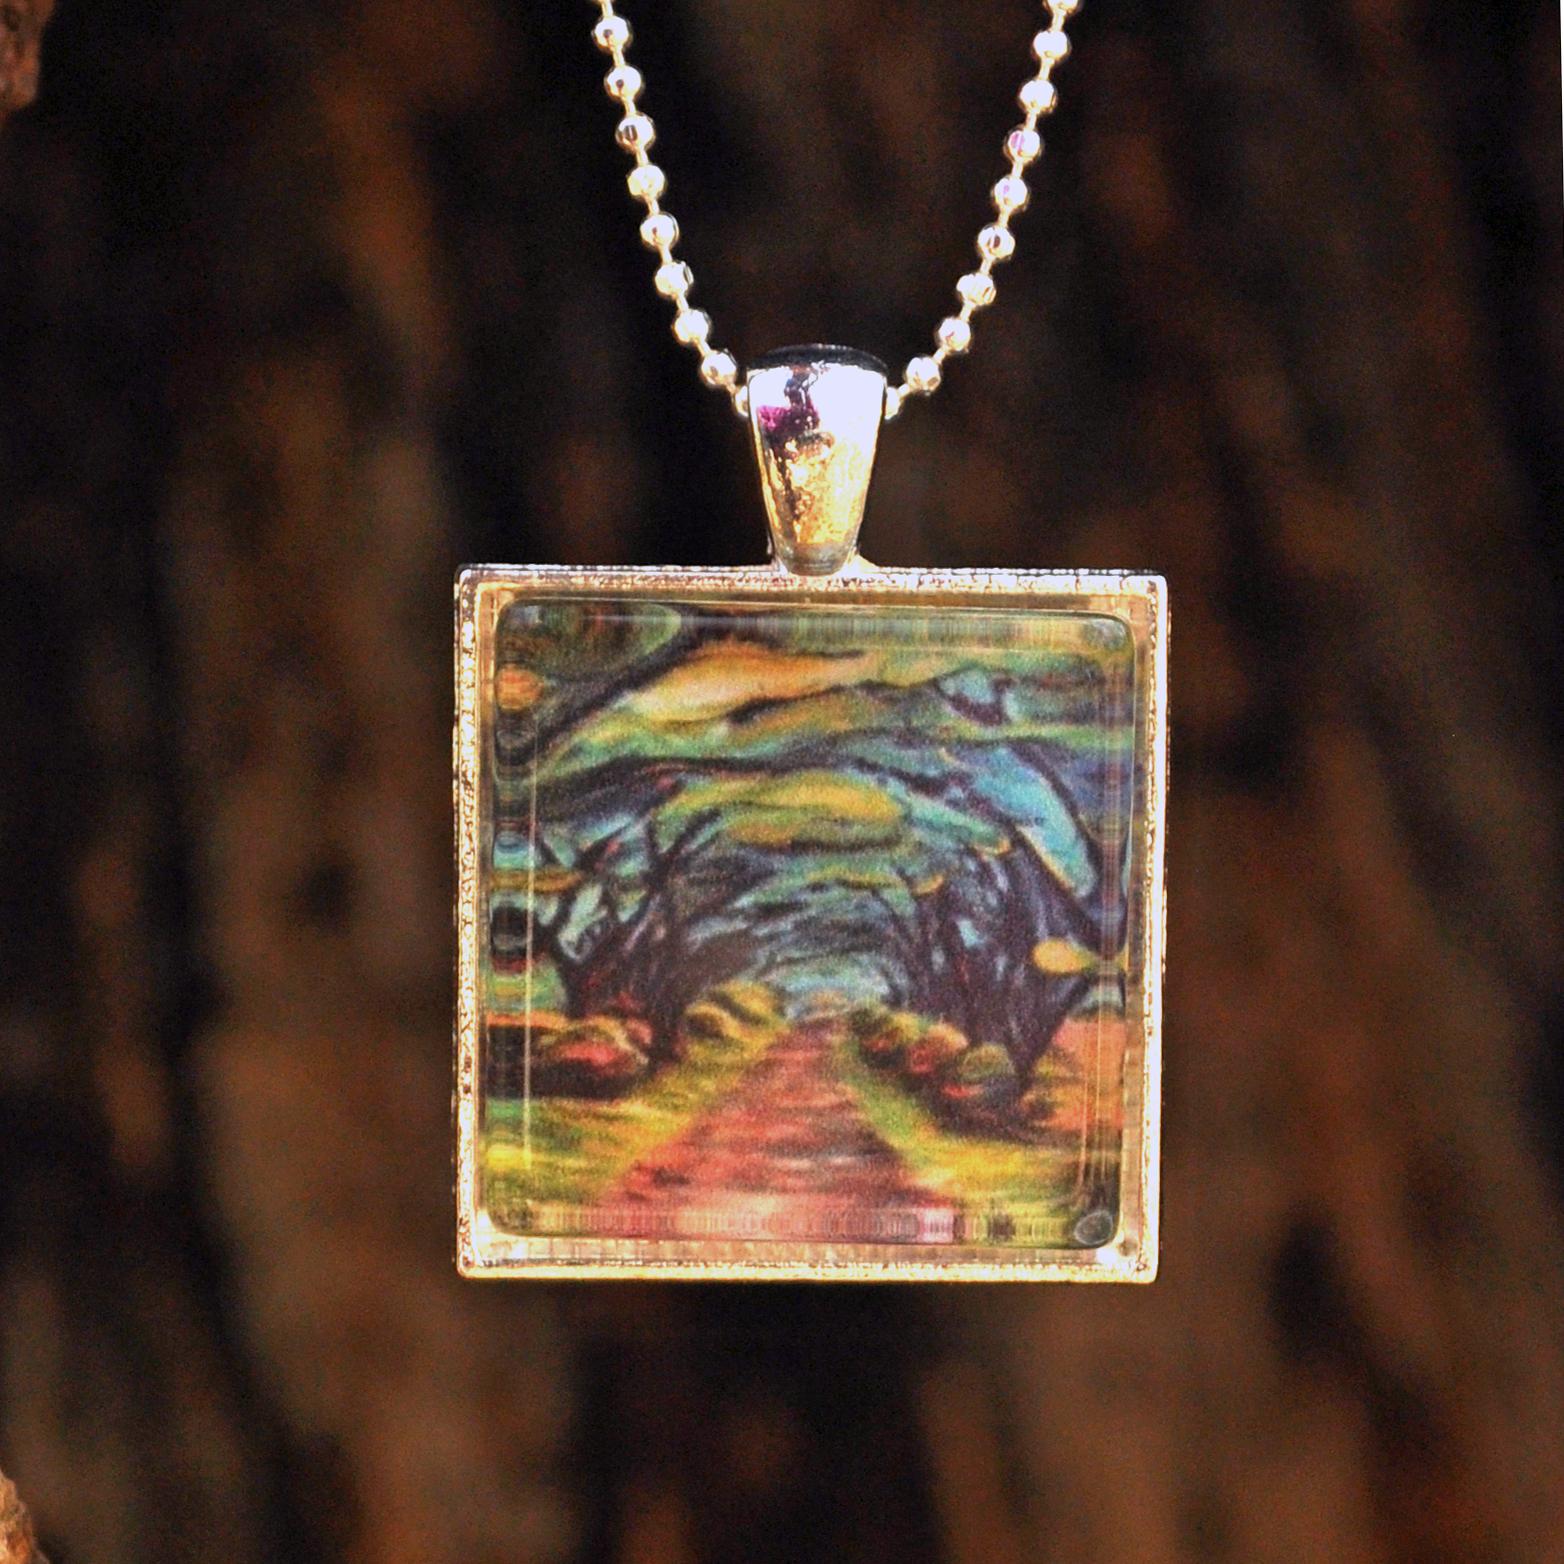 Path Through the Trees by Monica Hokeilen, pendant